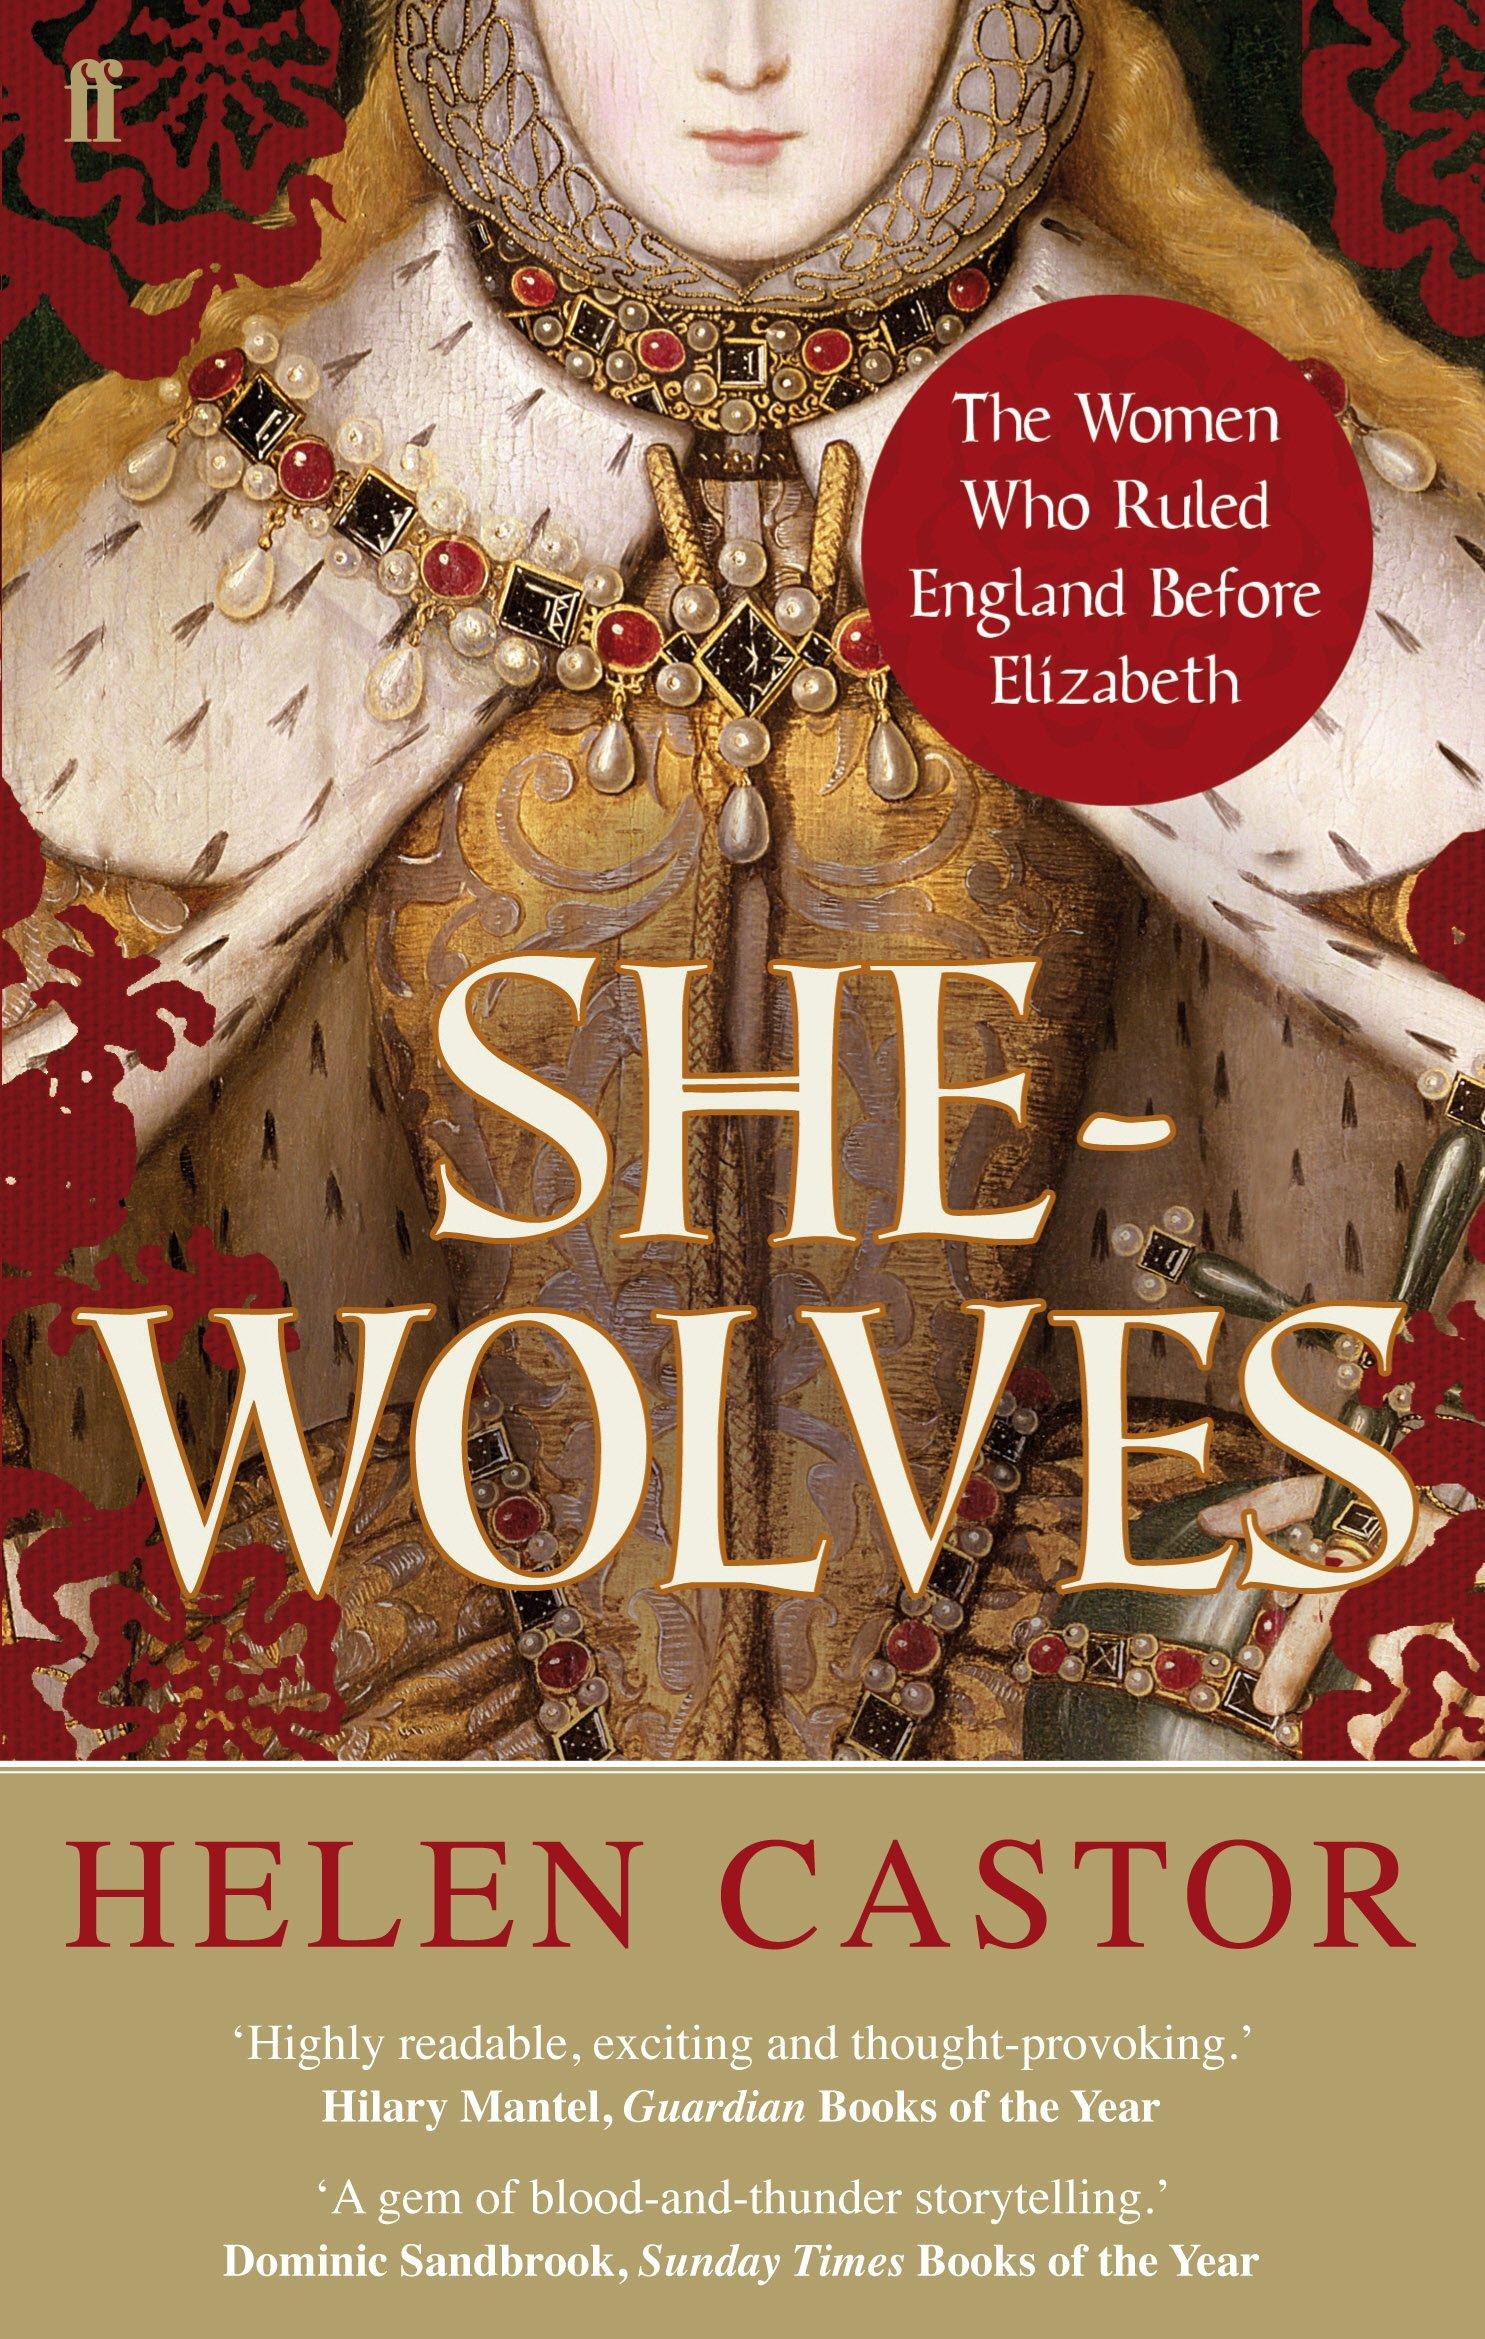 dea20ff5f She-Wolves: The Women Who Ruled England Before Elizabeth: Amazon.co ...